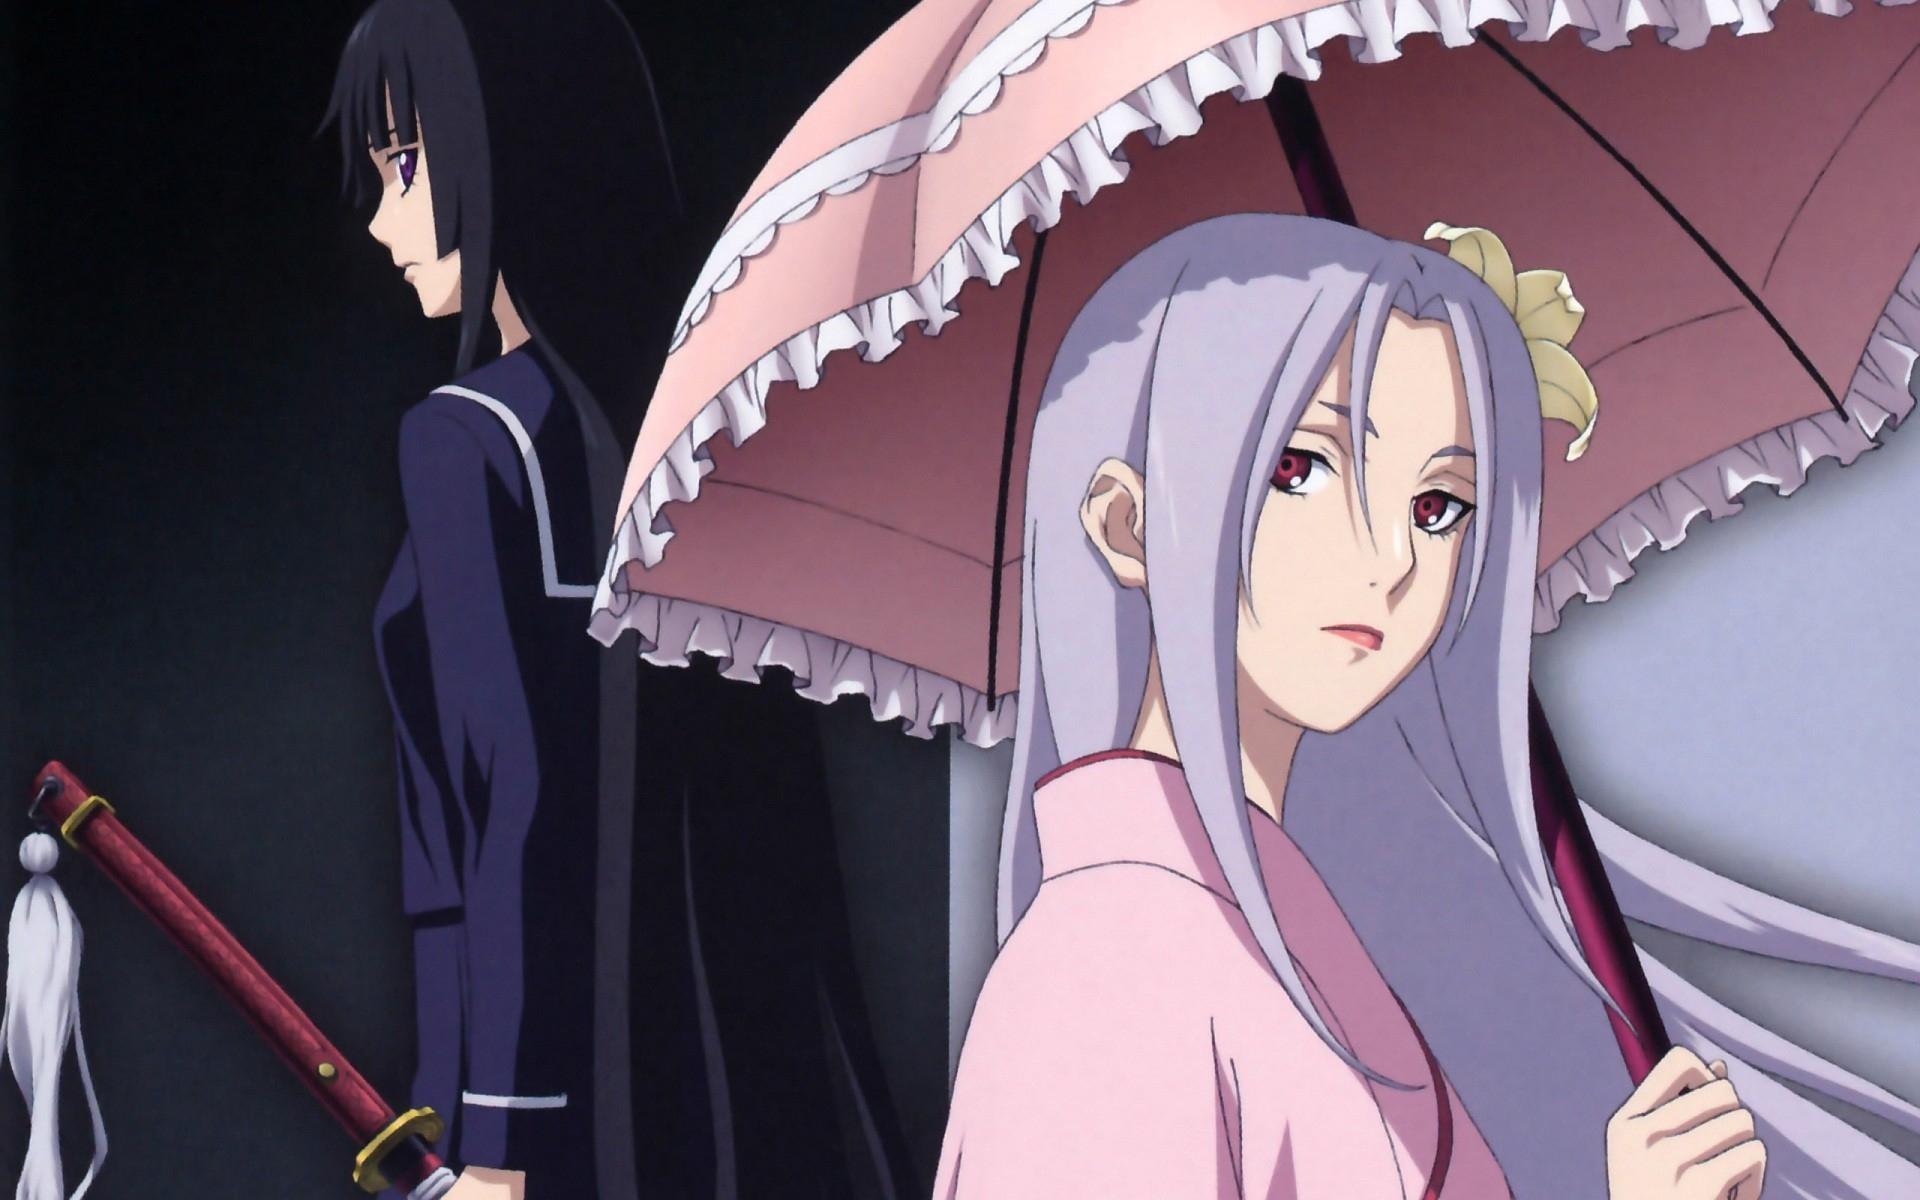 Wallpaper Illustration Anime Umbrella Cartoon Sadness Girls Look Screenshot Mangaka 1920x1200 Wallup 724793 Hd Wallpapers Wallhere